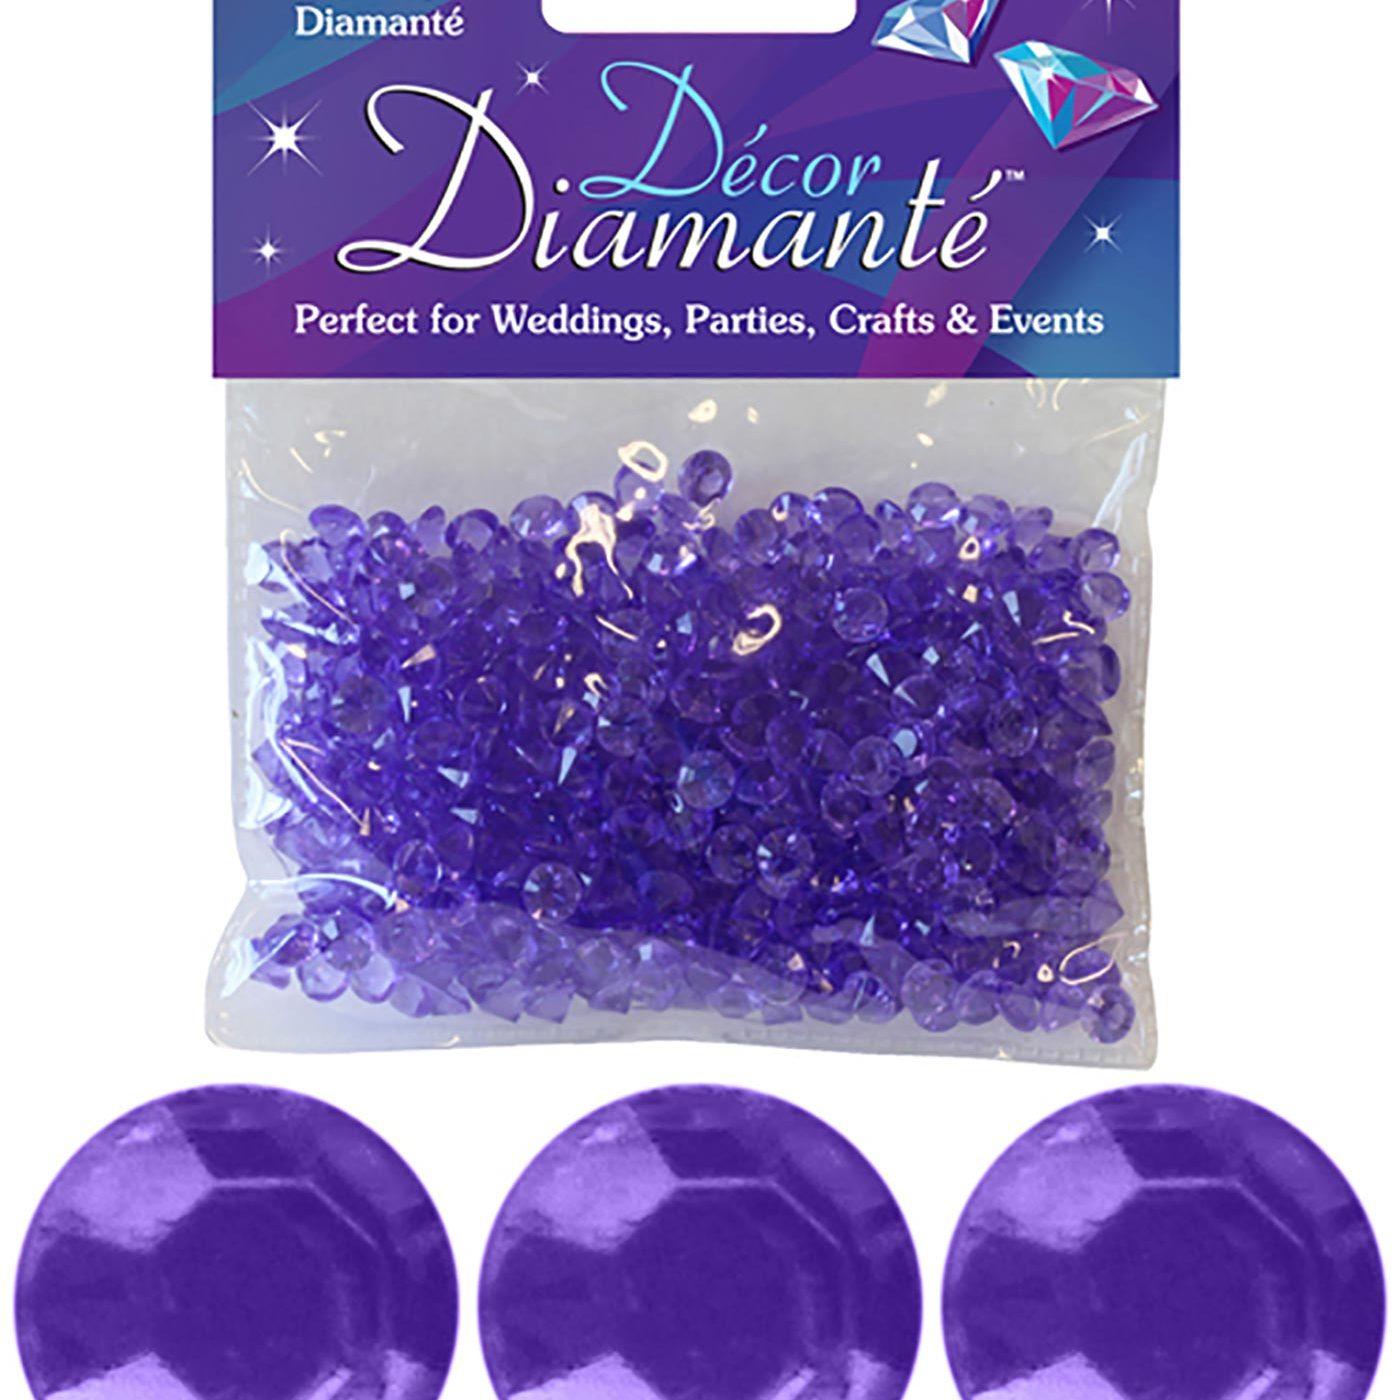 6mm Décor Diamante Diamonds 28g No.45 Lavender